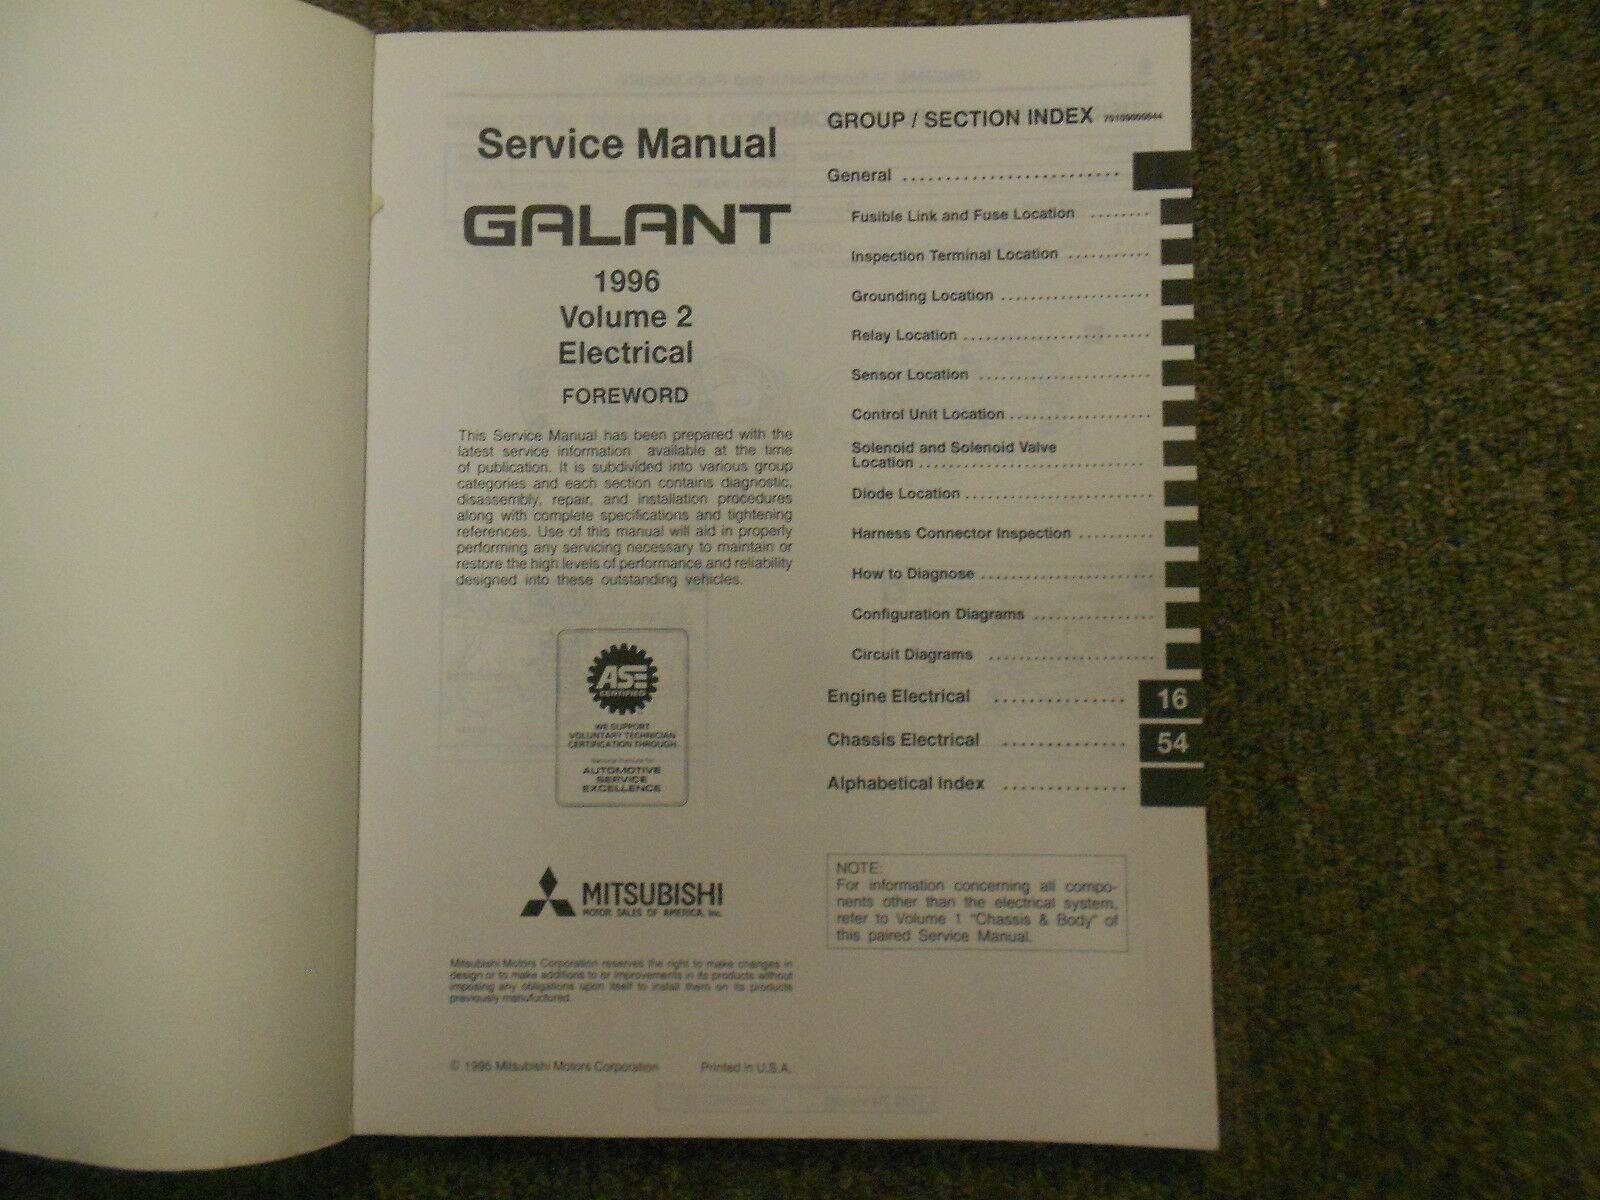 1997 MITSUBISHI Galant Service Repair Shop Manual FACTORY OEM BOOK 97 VOL 2 DEAL